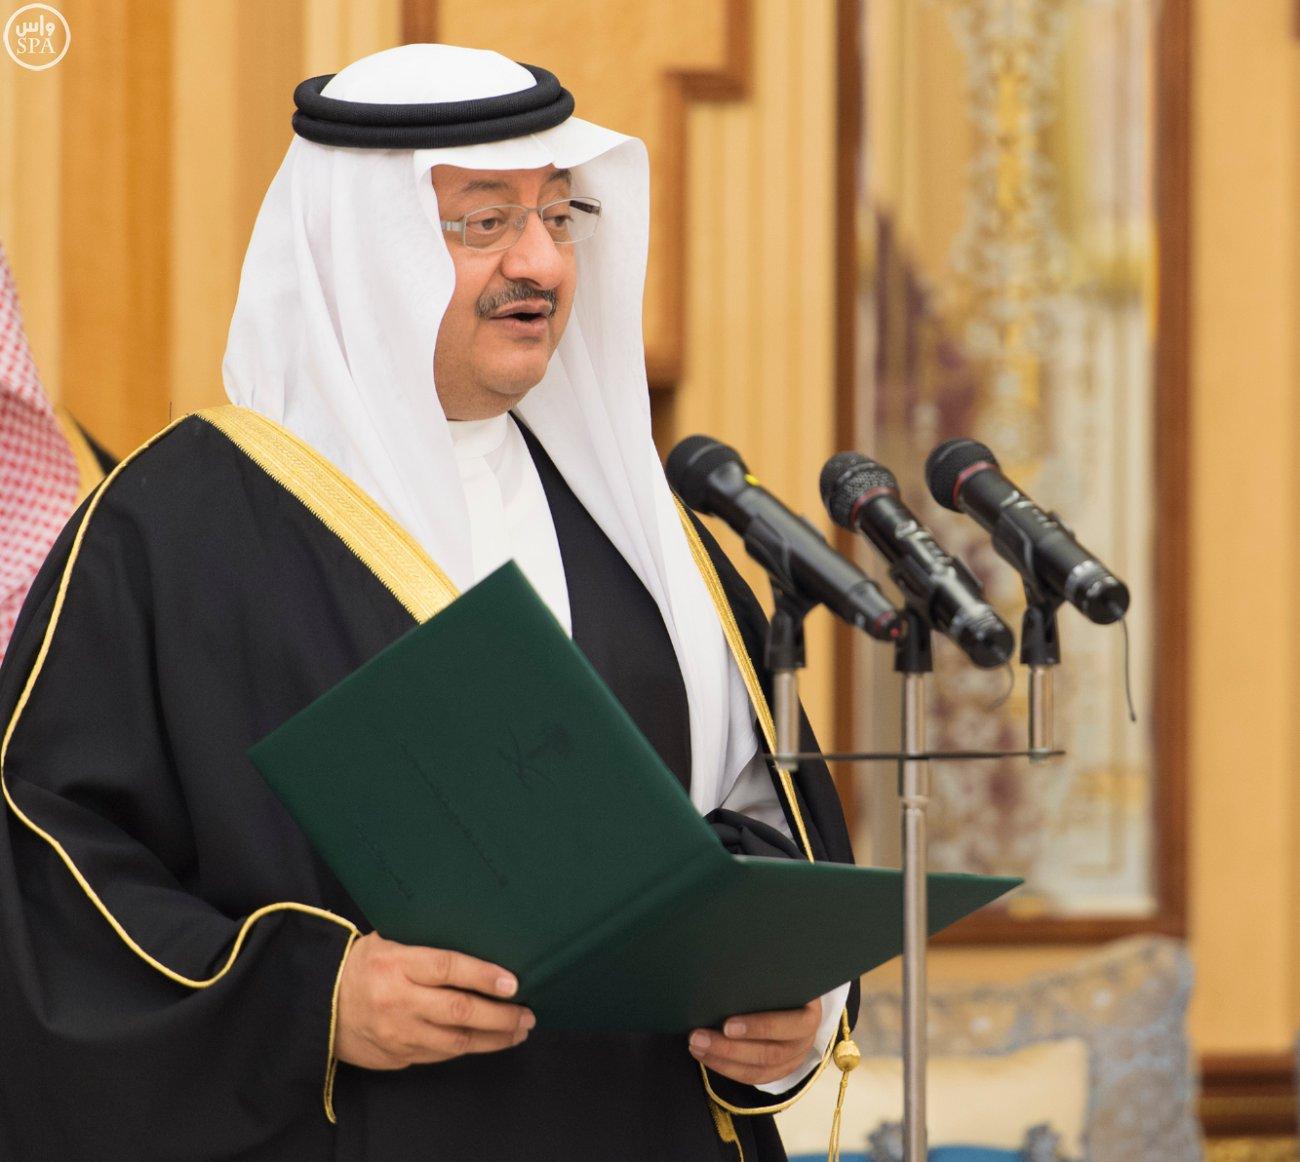 https://www.sustg.com/wp-content/uploads/2015/10/prince-Abdullah-bin-Faisal-bin-Turki-ABF-Swearing-in.jpg